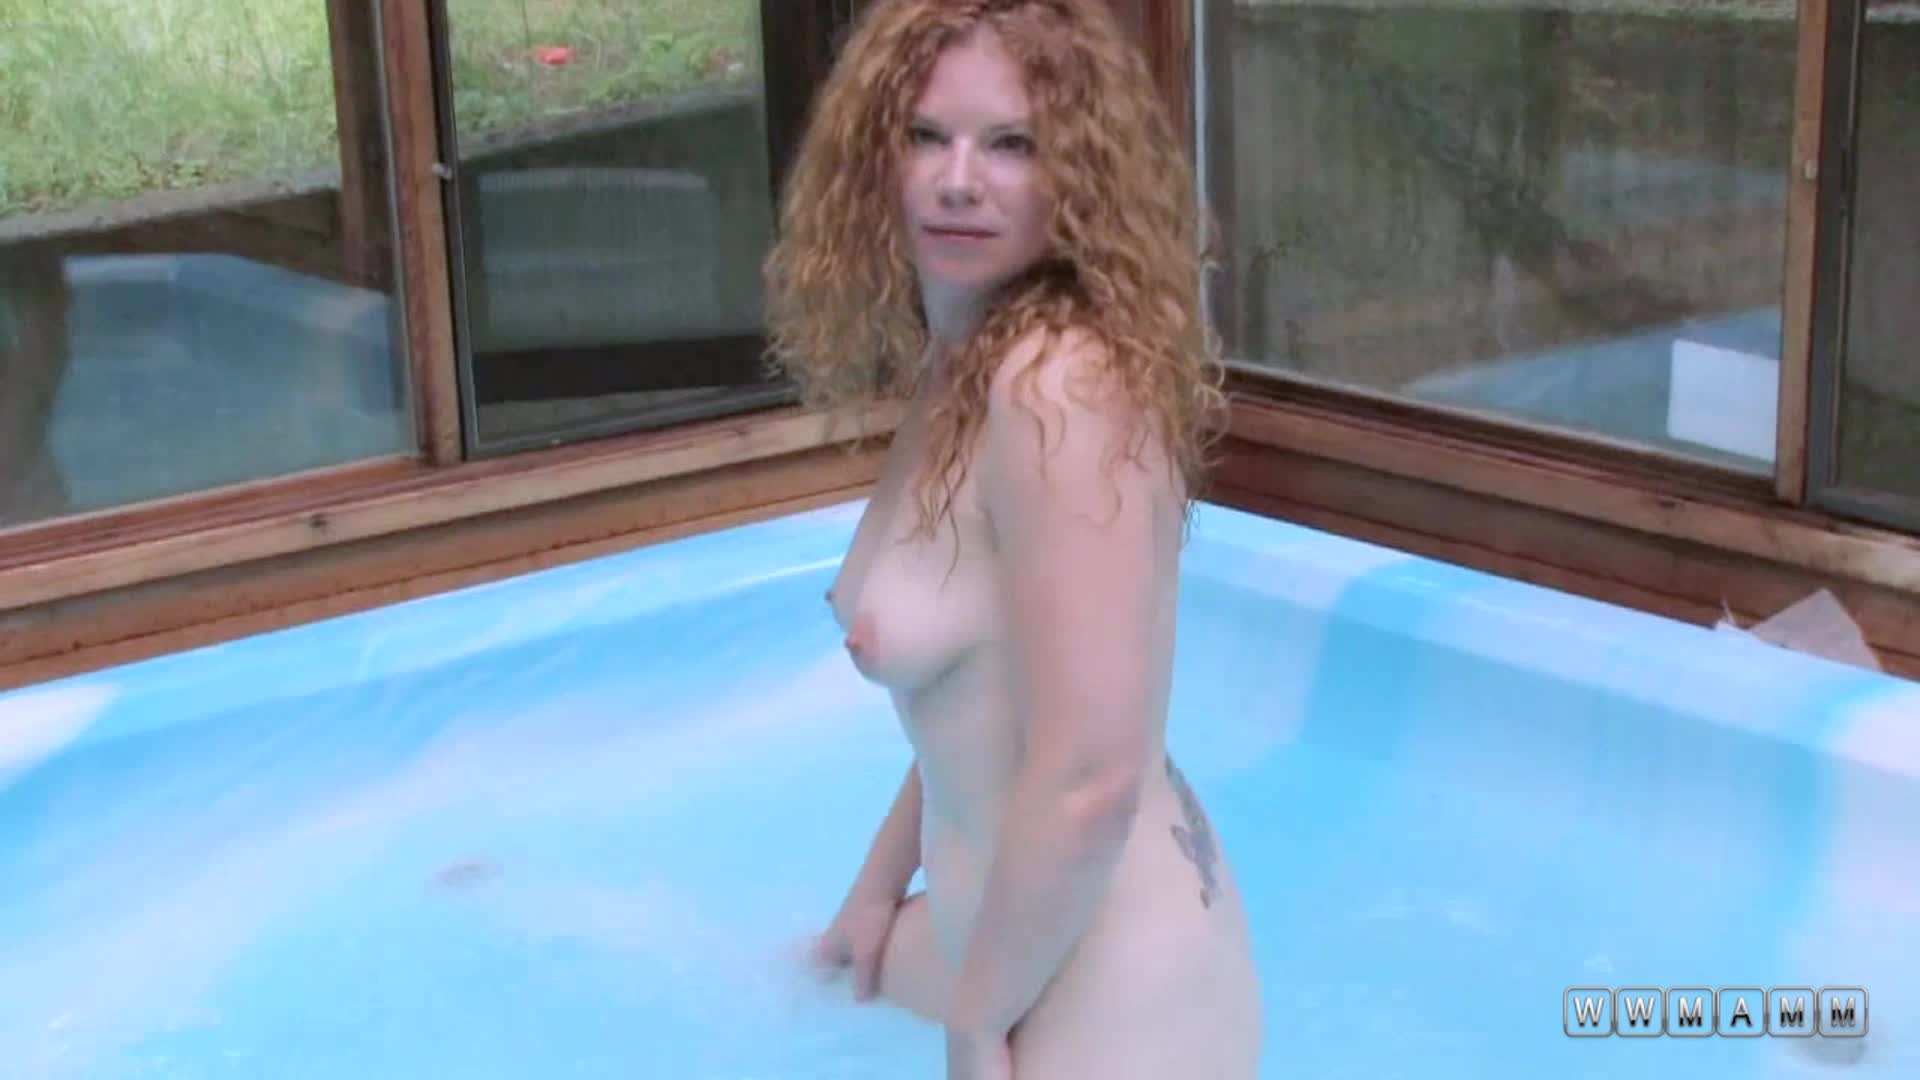 Horny Milf Gina Gets Naughty And Masturbates In The Hot Tub